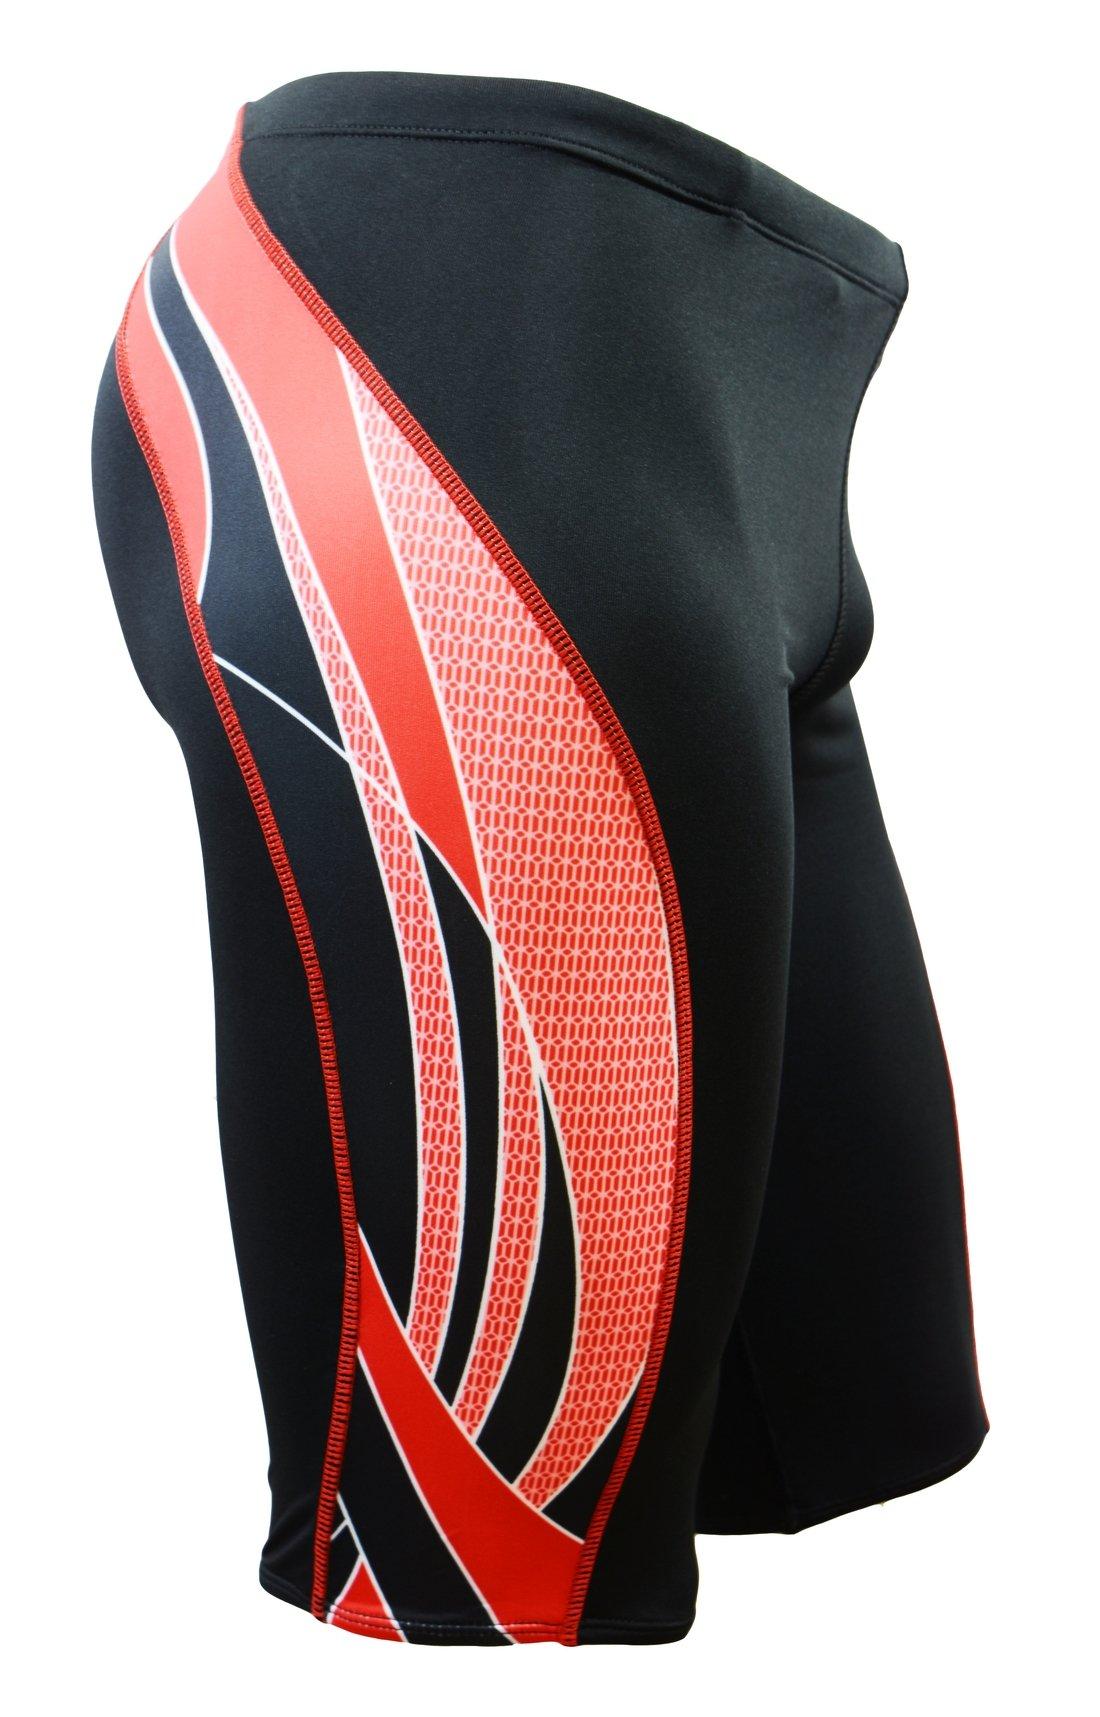 Adoretex Mens Side Wings Swim Jammer Swimwear (MJ009) - Black/Red - 30